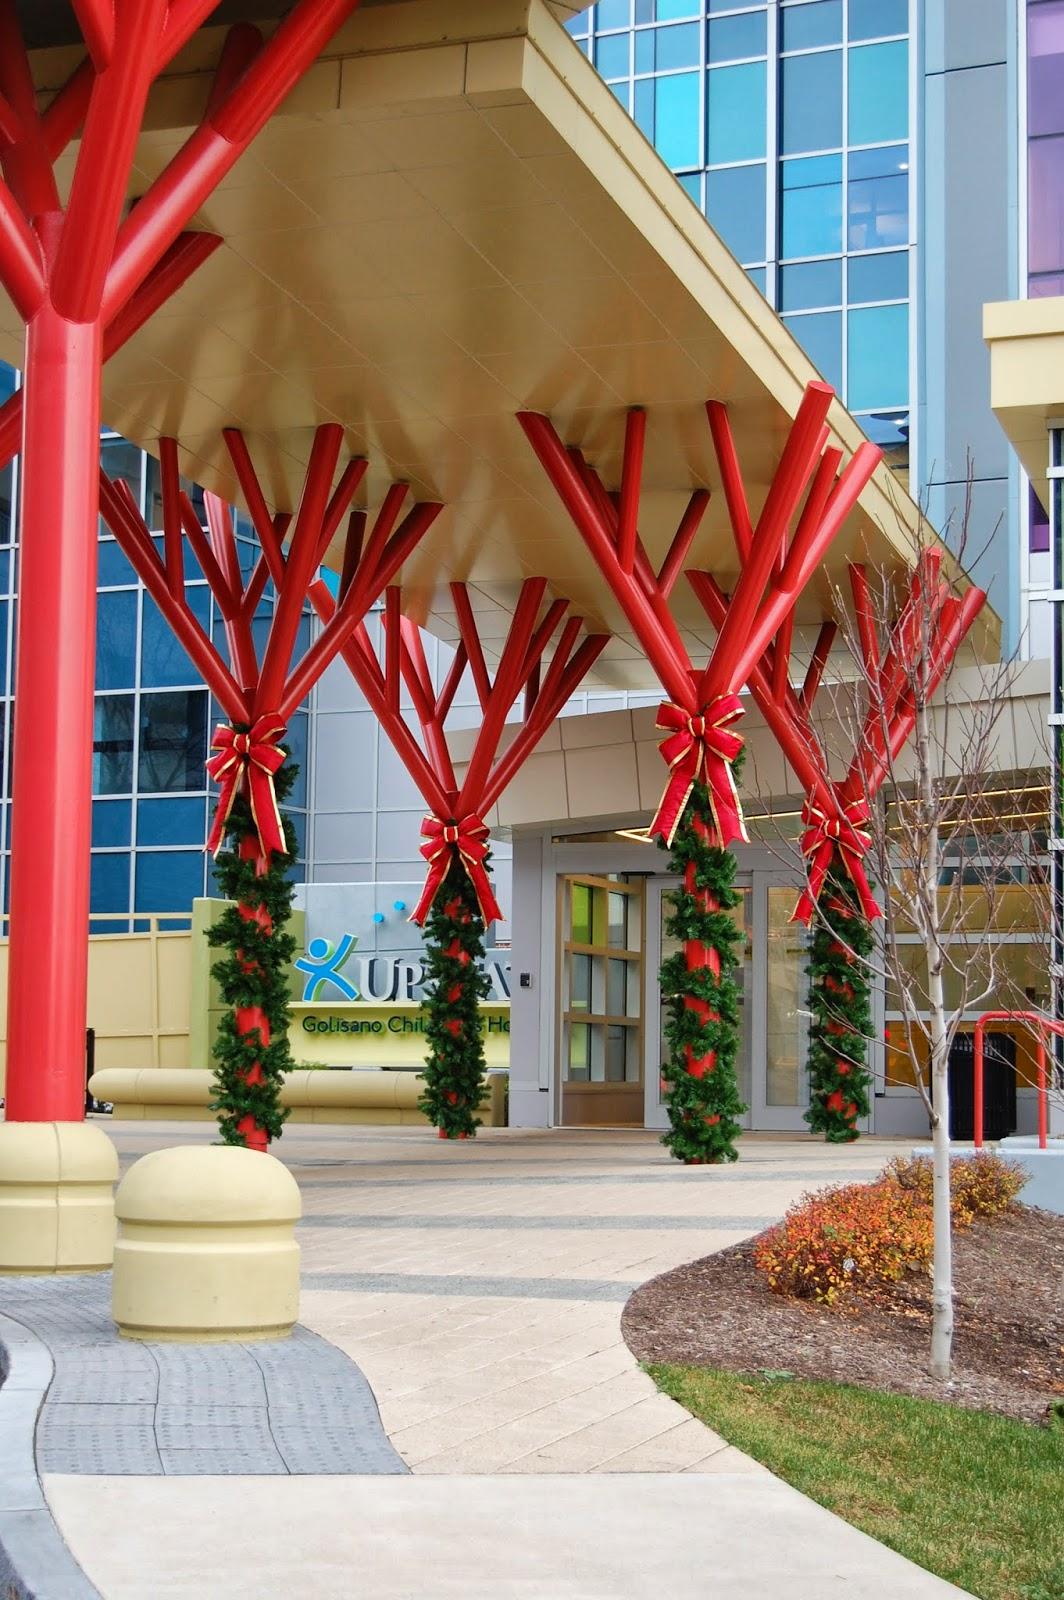 Downtown Decorations, Inc.: Upstate Golisano Children's ...